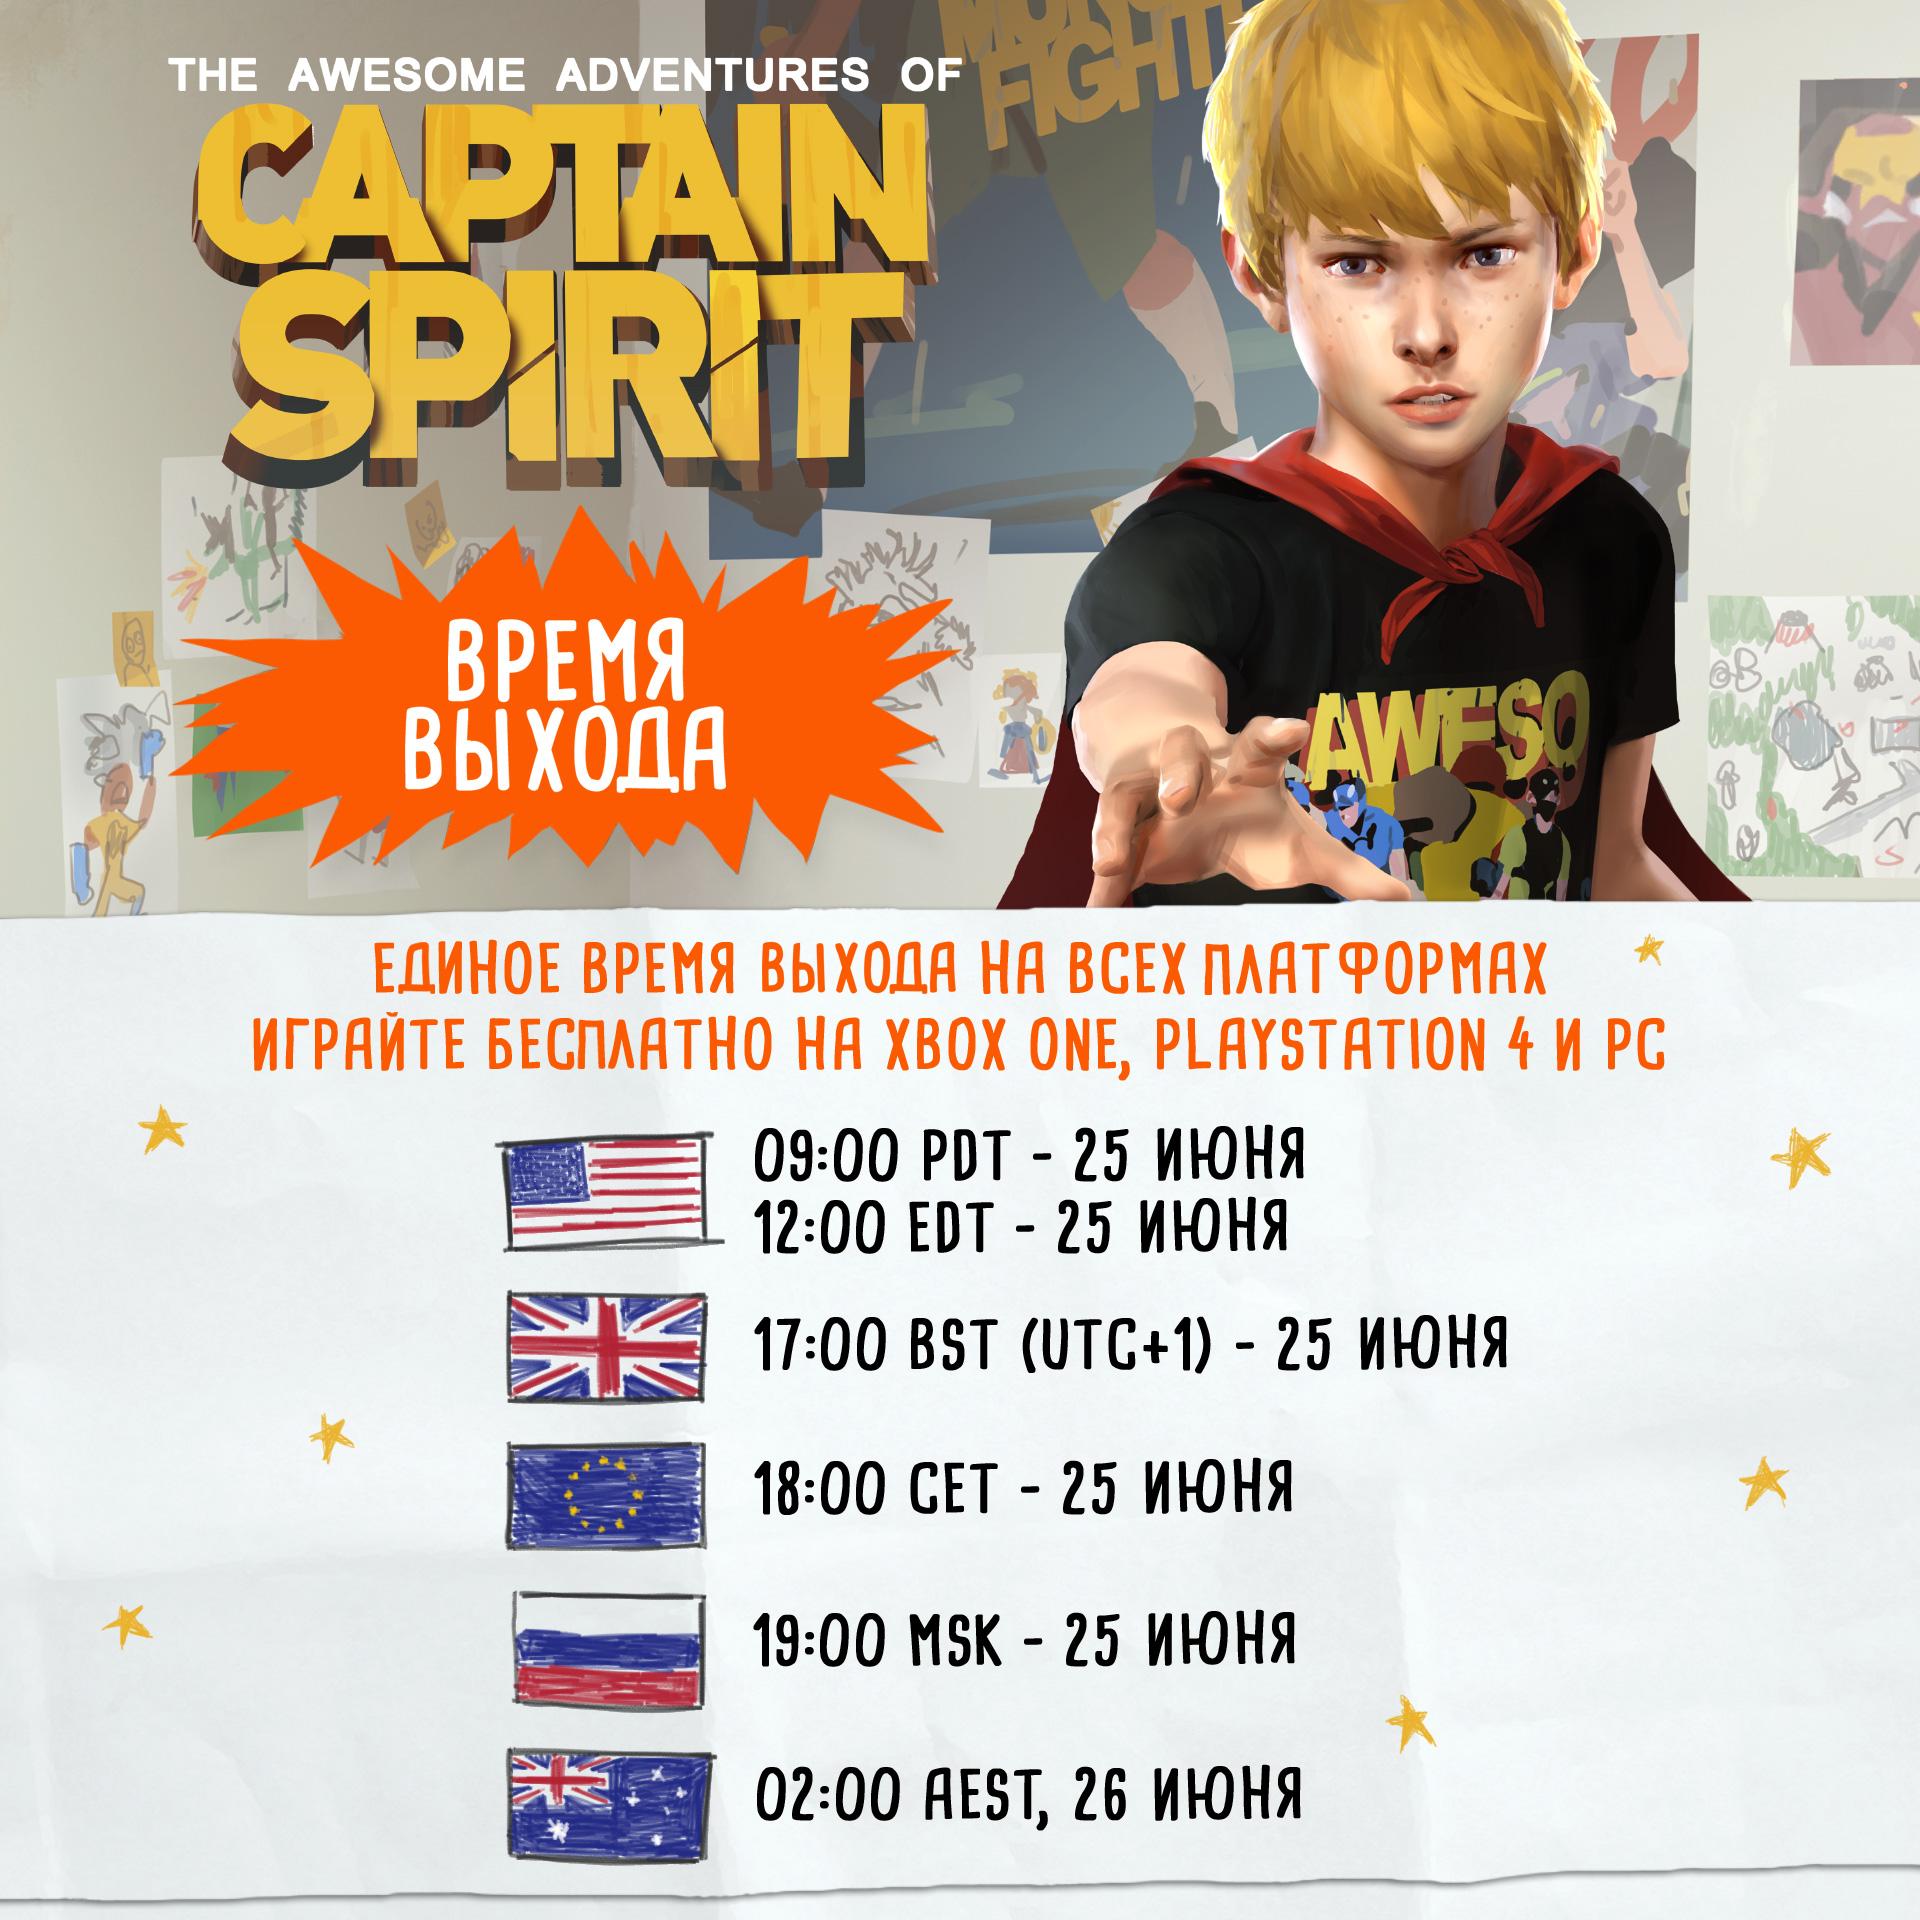 Точное время запуска «Капитана Призрака»